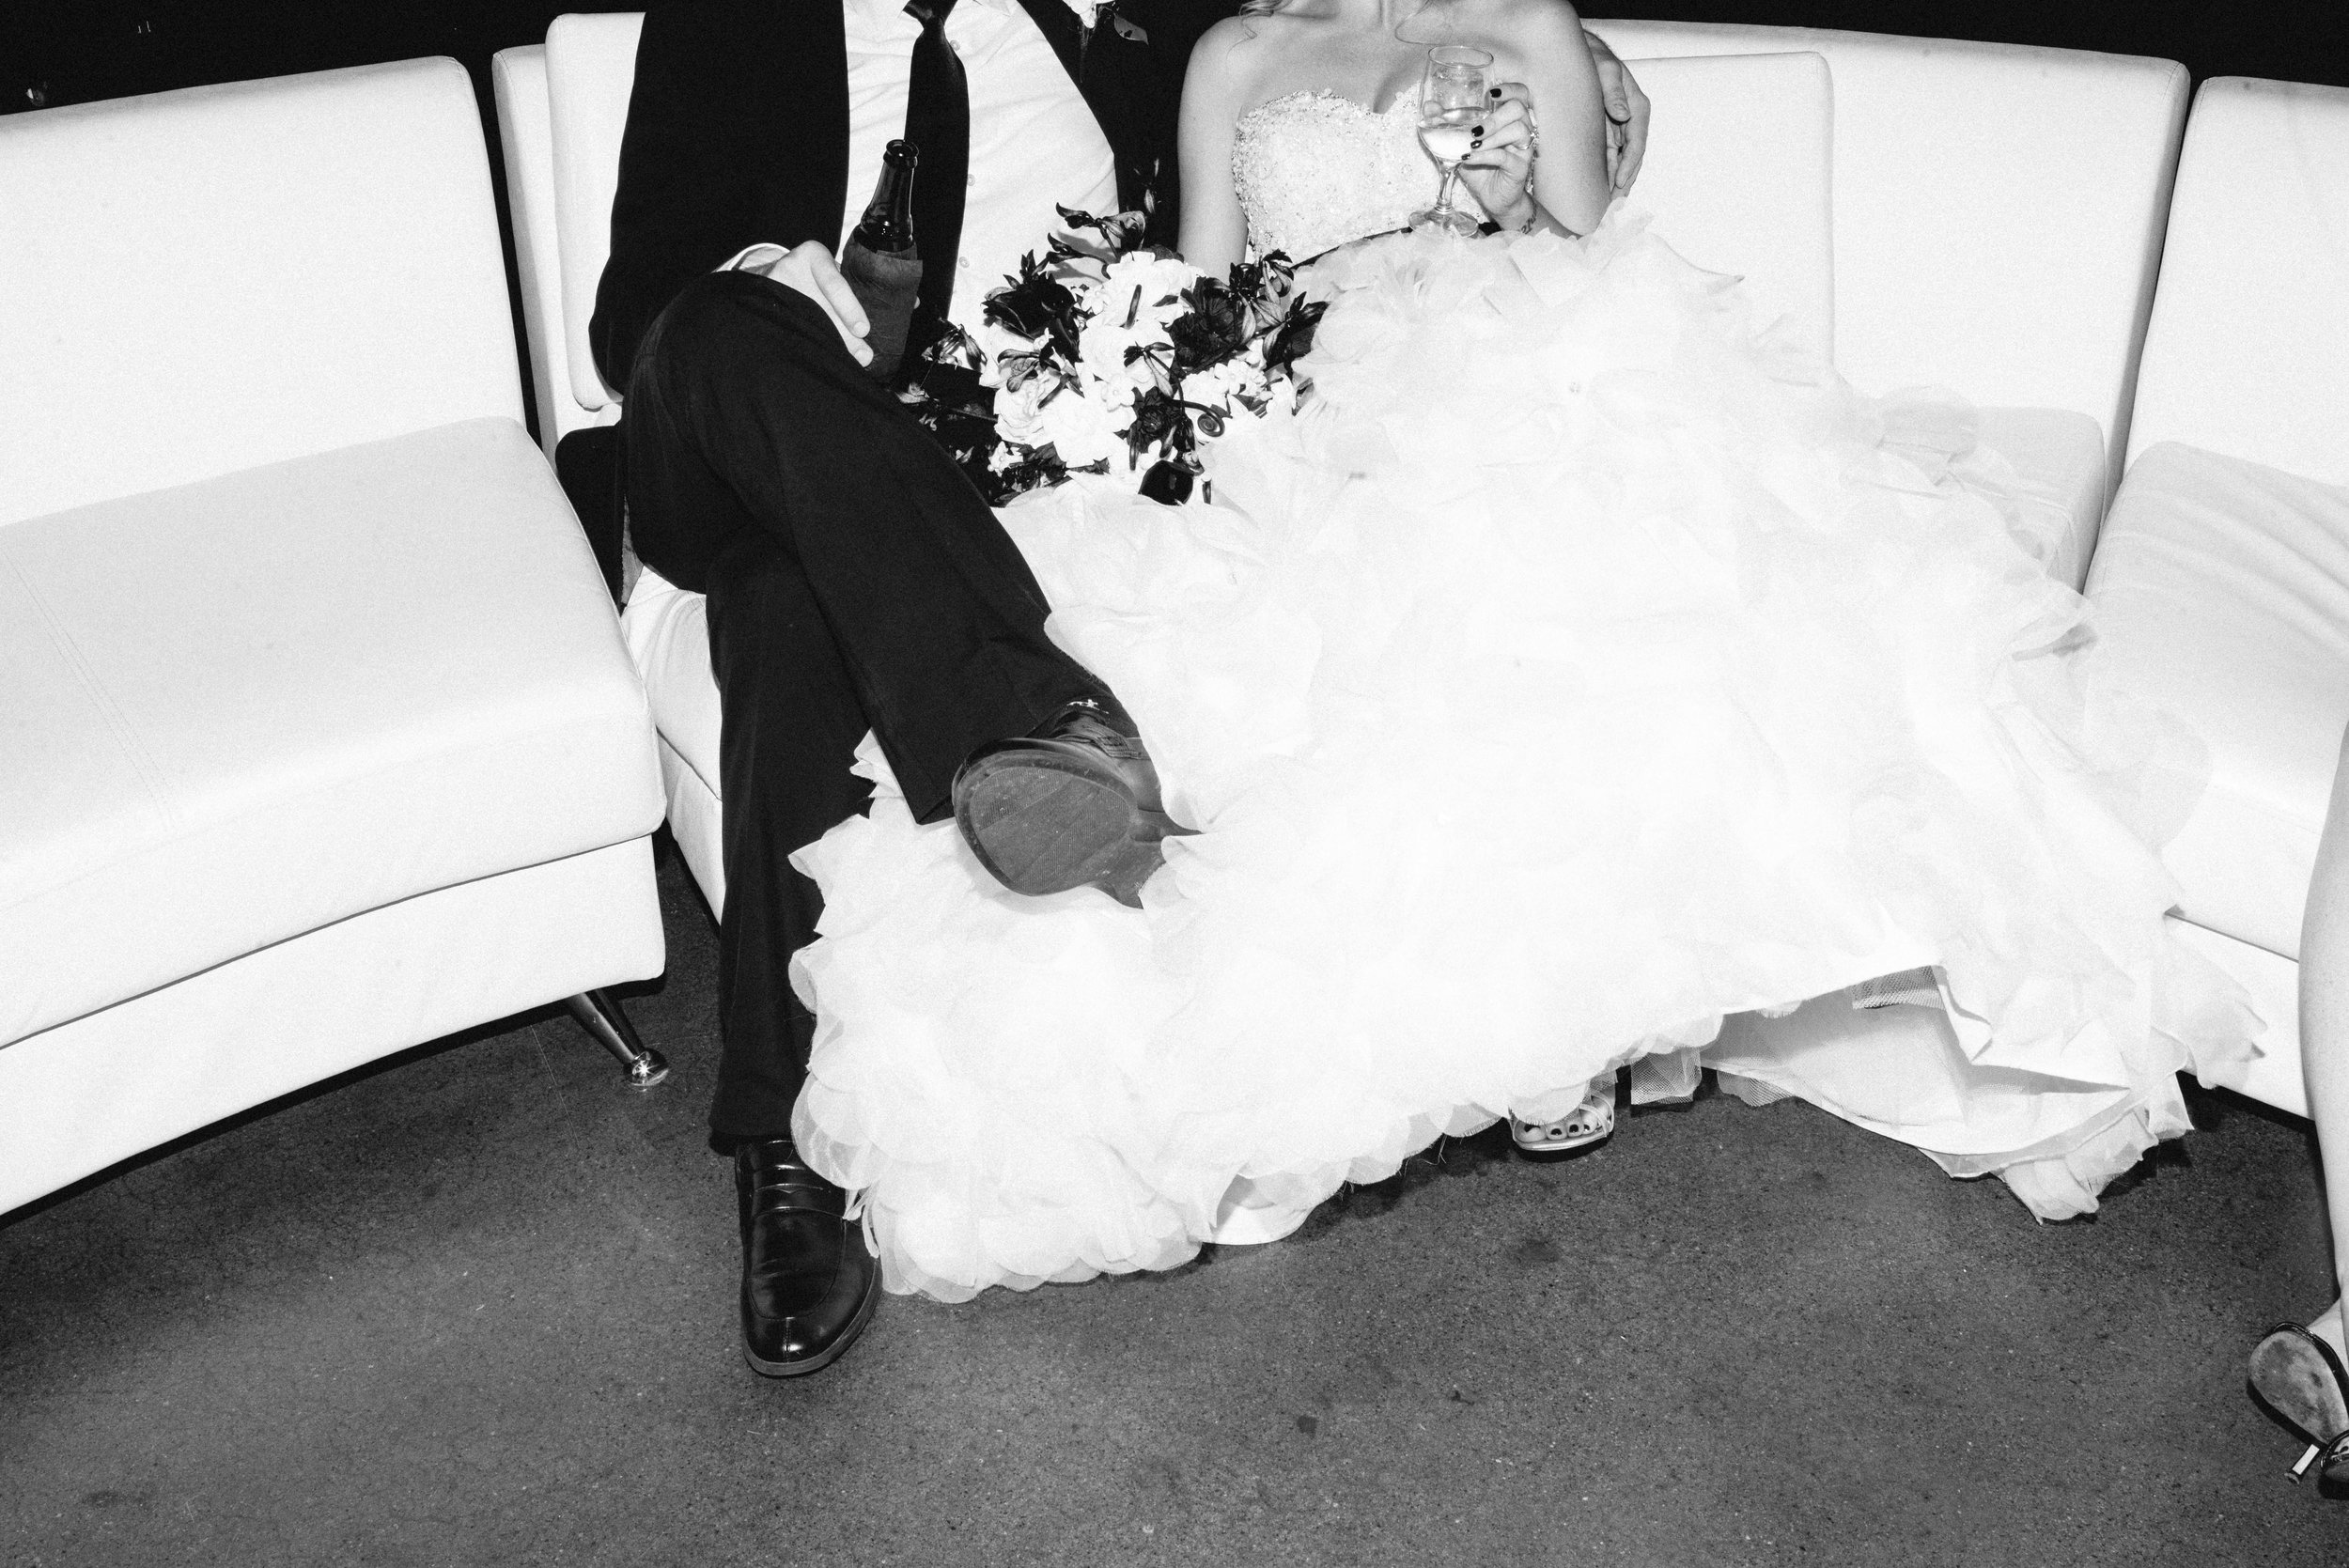 Annie-Justin-Blog-Indianapolis-Wedding-131.jpg